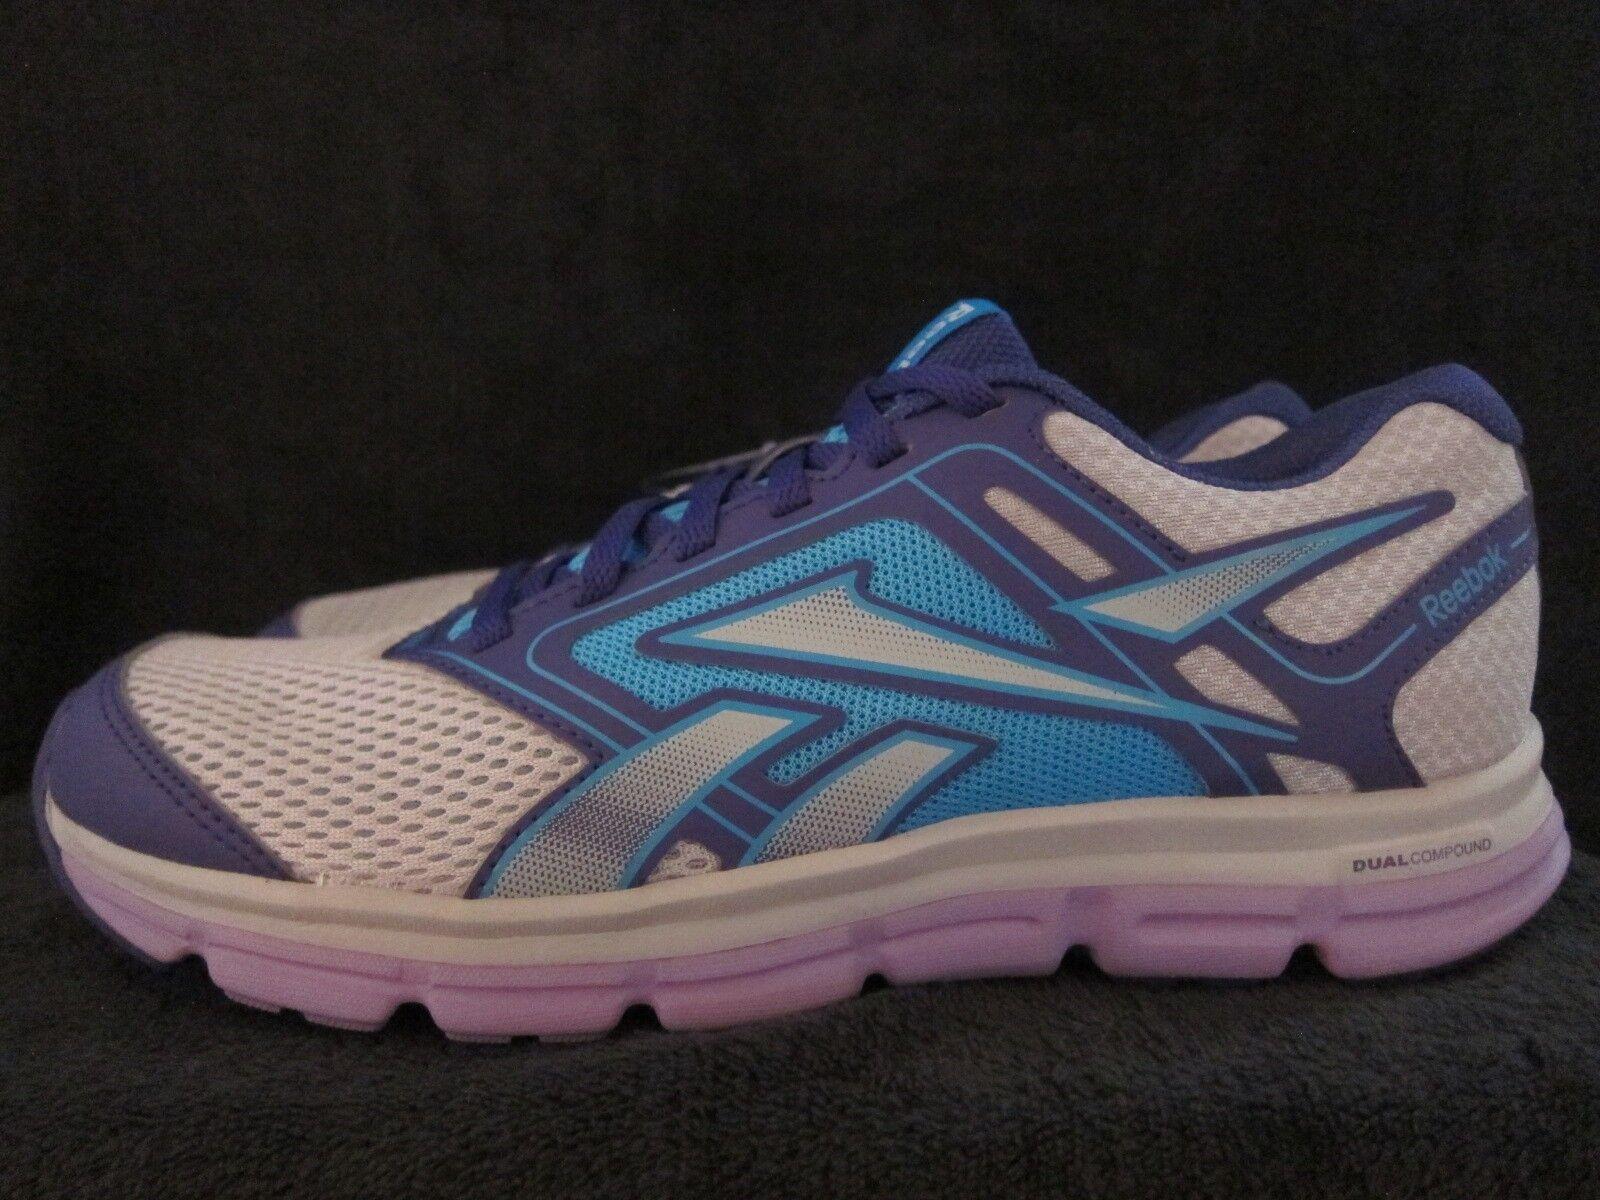 REEBOK kvinnas Dual Compound Compound Compound Turbo grå springaning skor skor US 8 EUR 38.5 NWOB  bästa pris